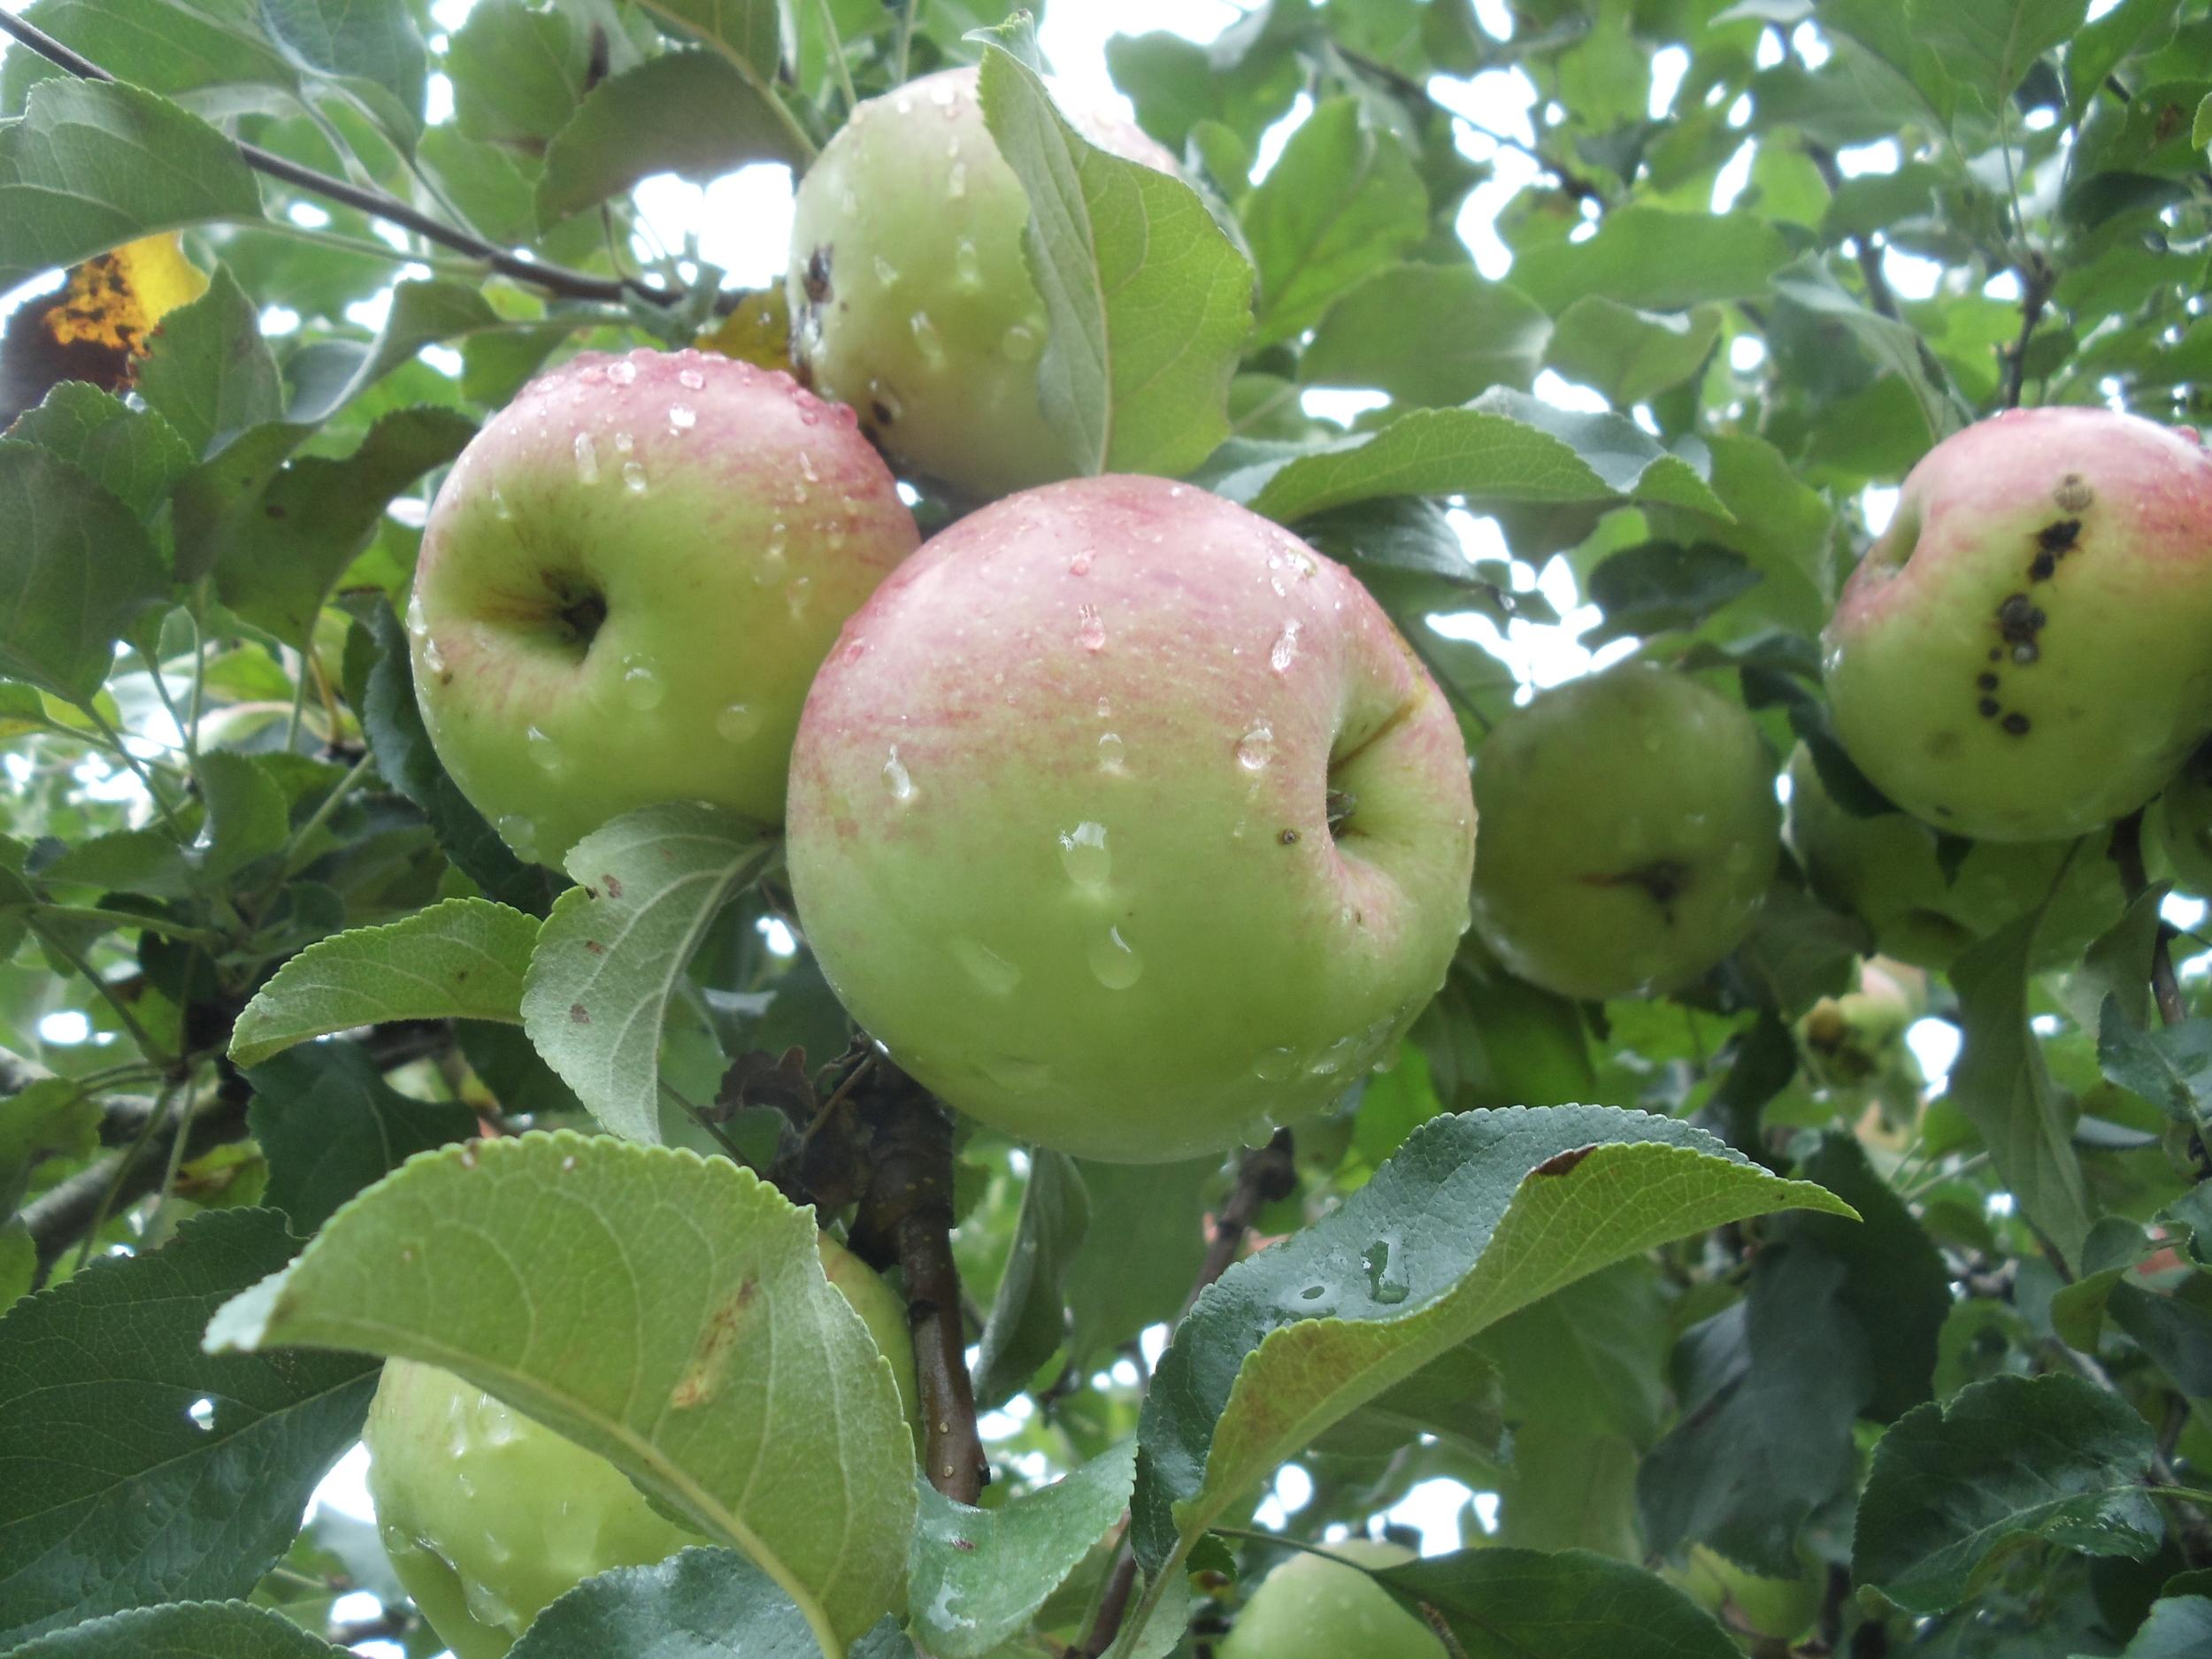 Charette apples, still on the tree